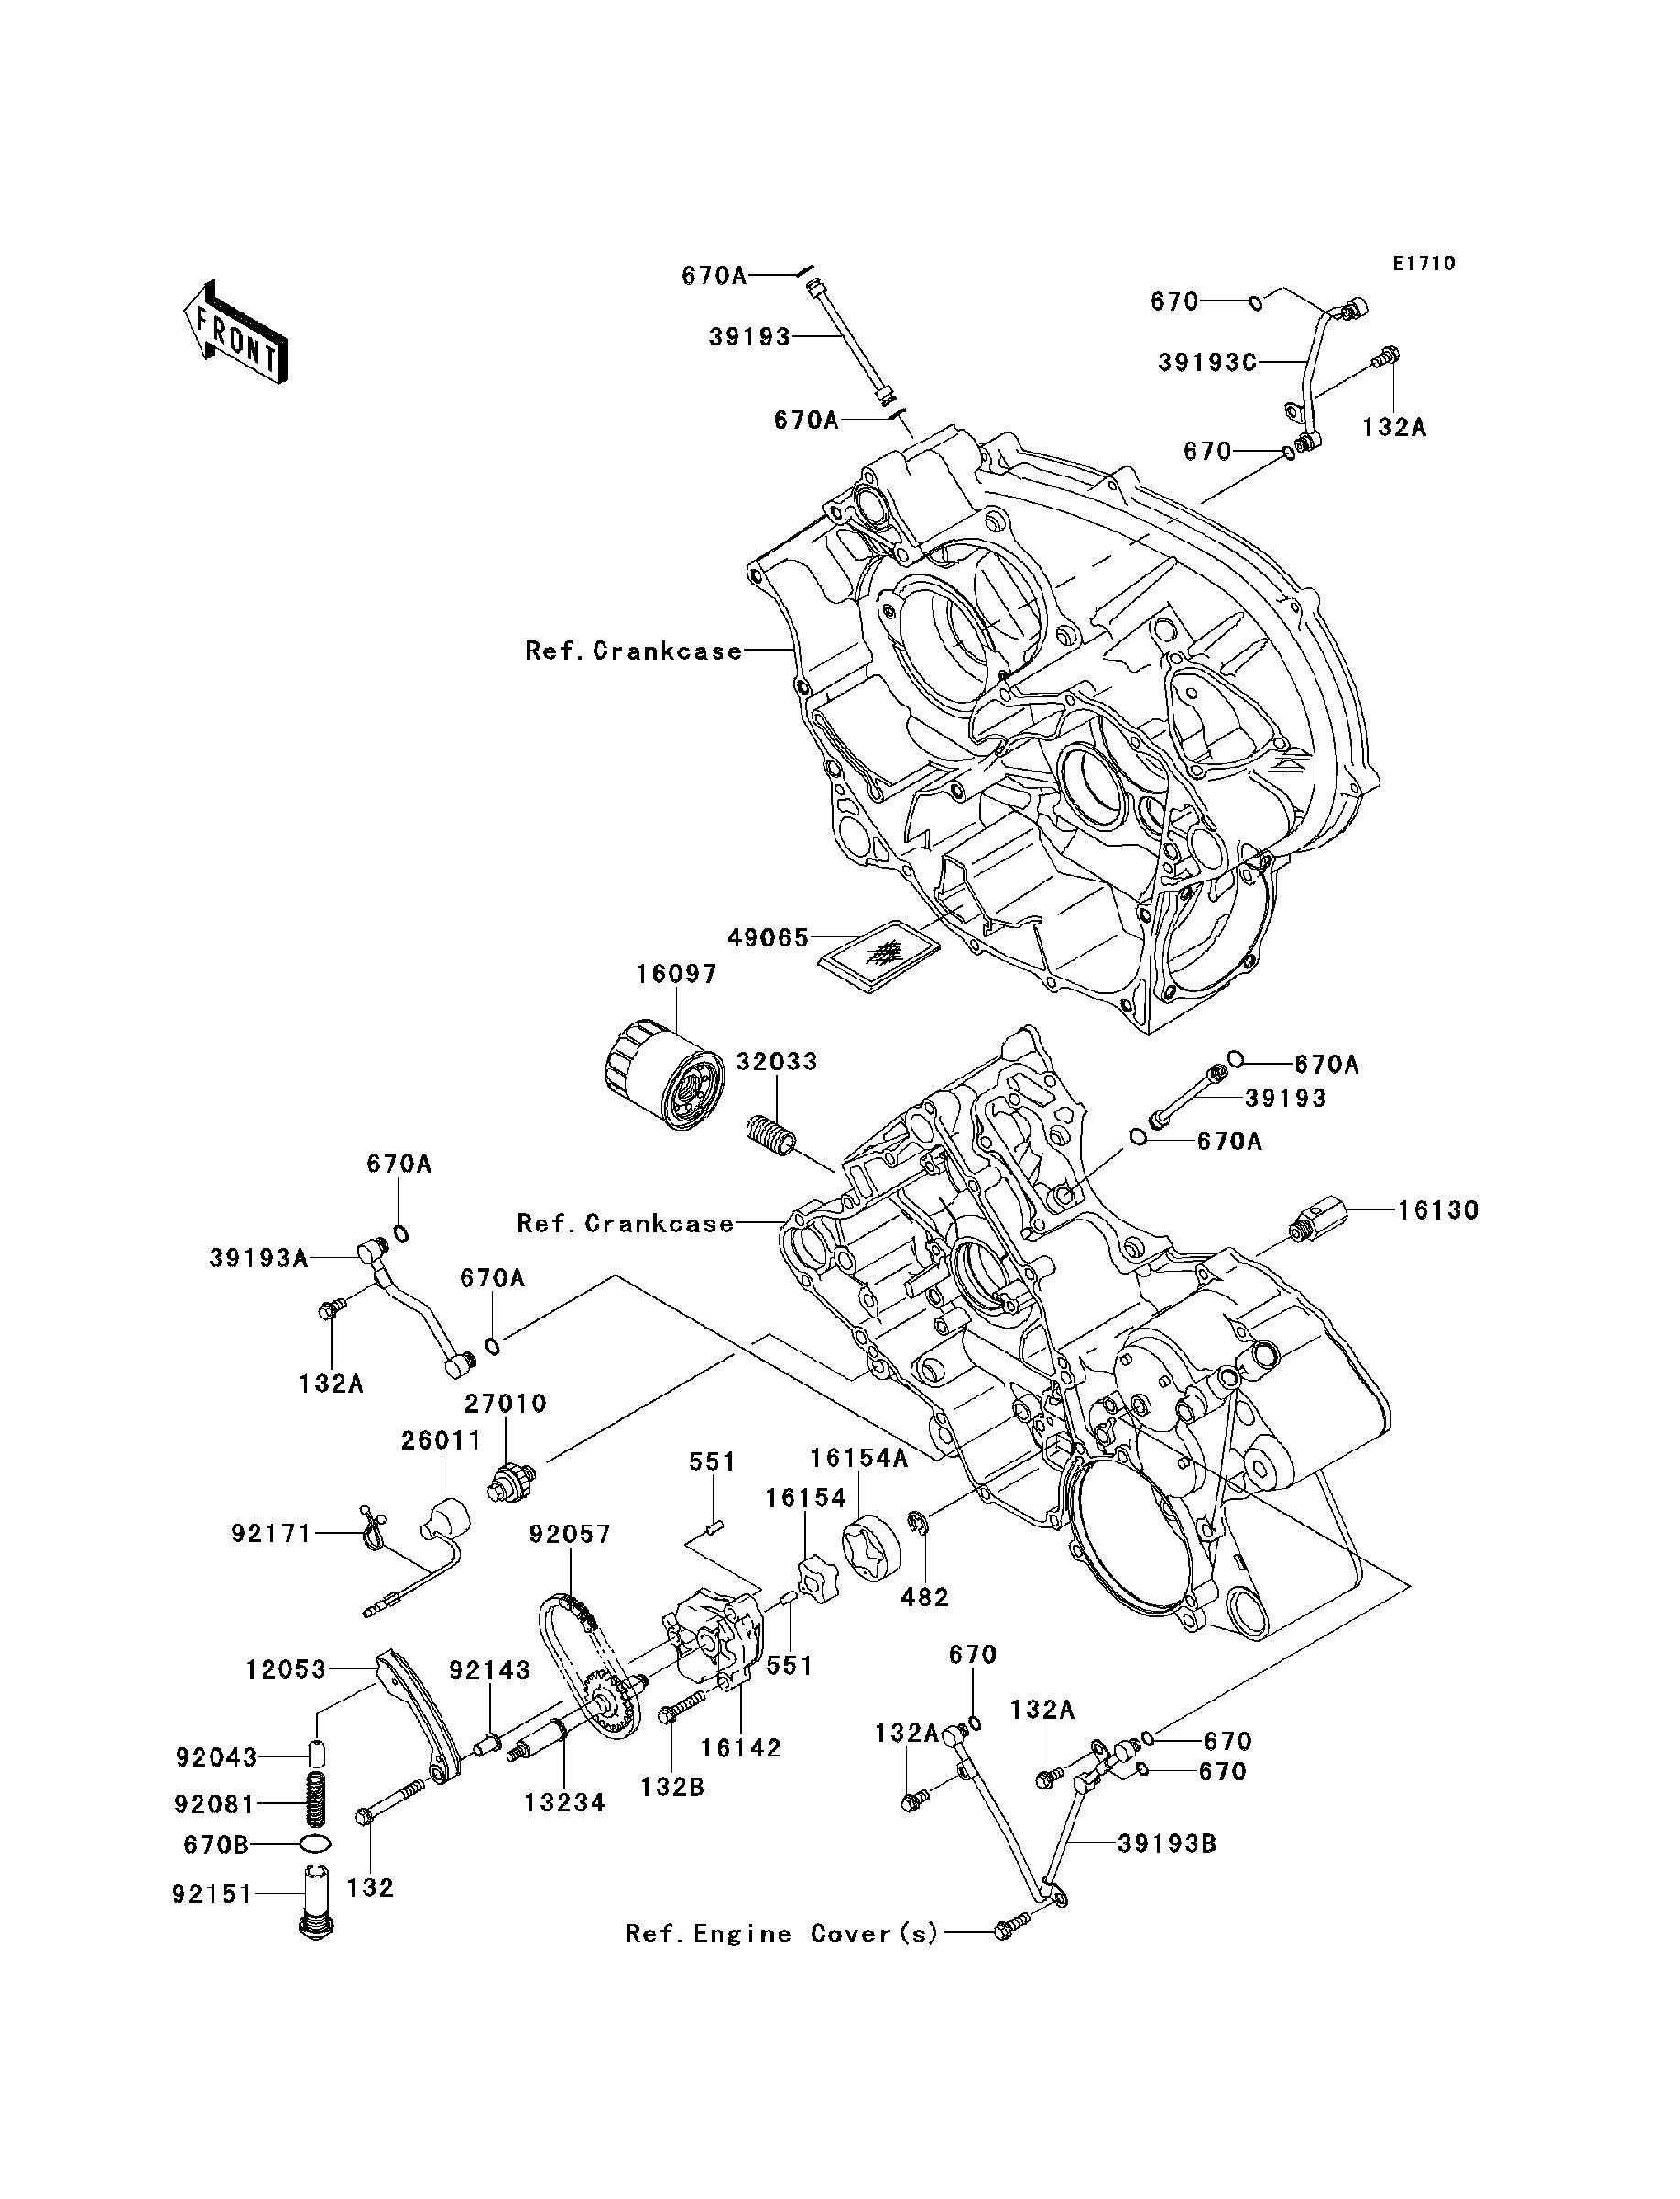 Diagram 2009 Kawasaki Teryx Cdi Wiring Diagram Picture Full Version Hd Quality Diagram Picture Diagrammoroo Abacusfirenze It